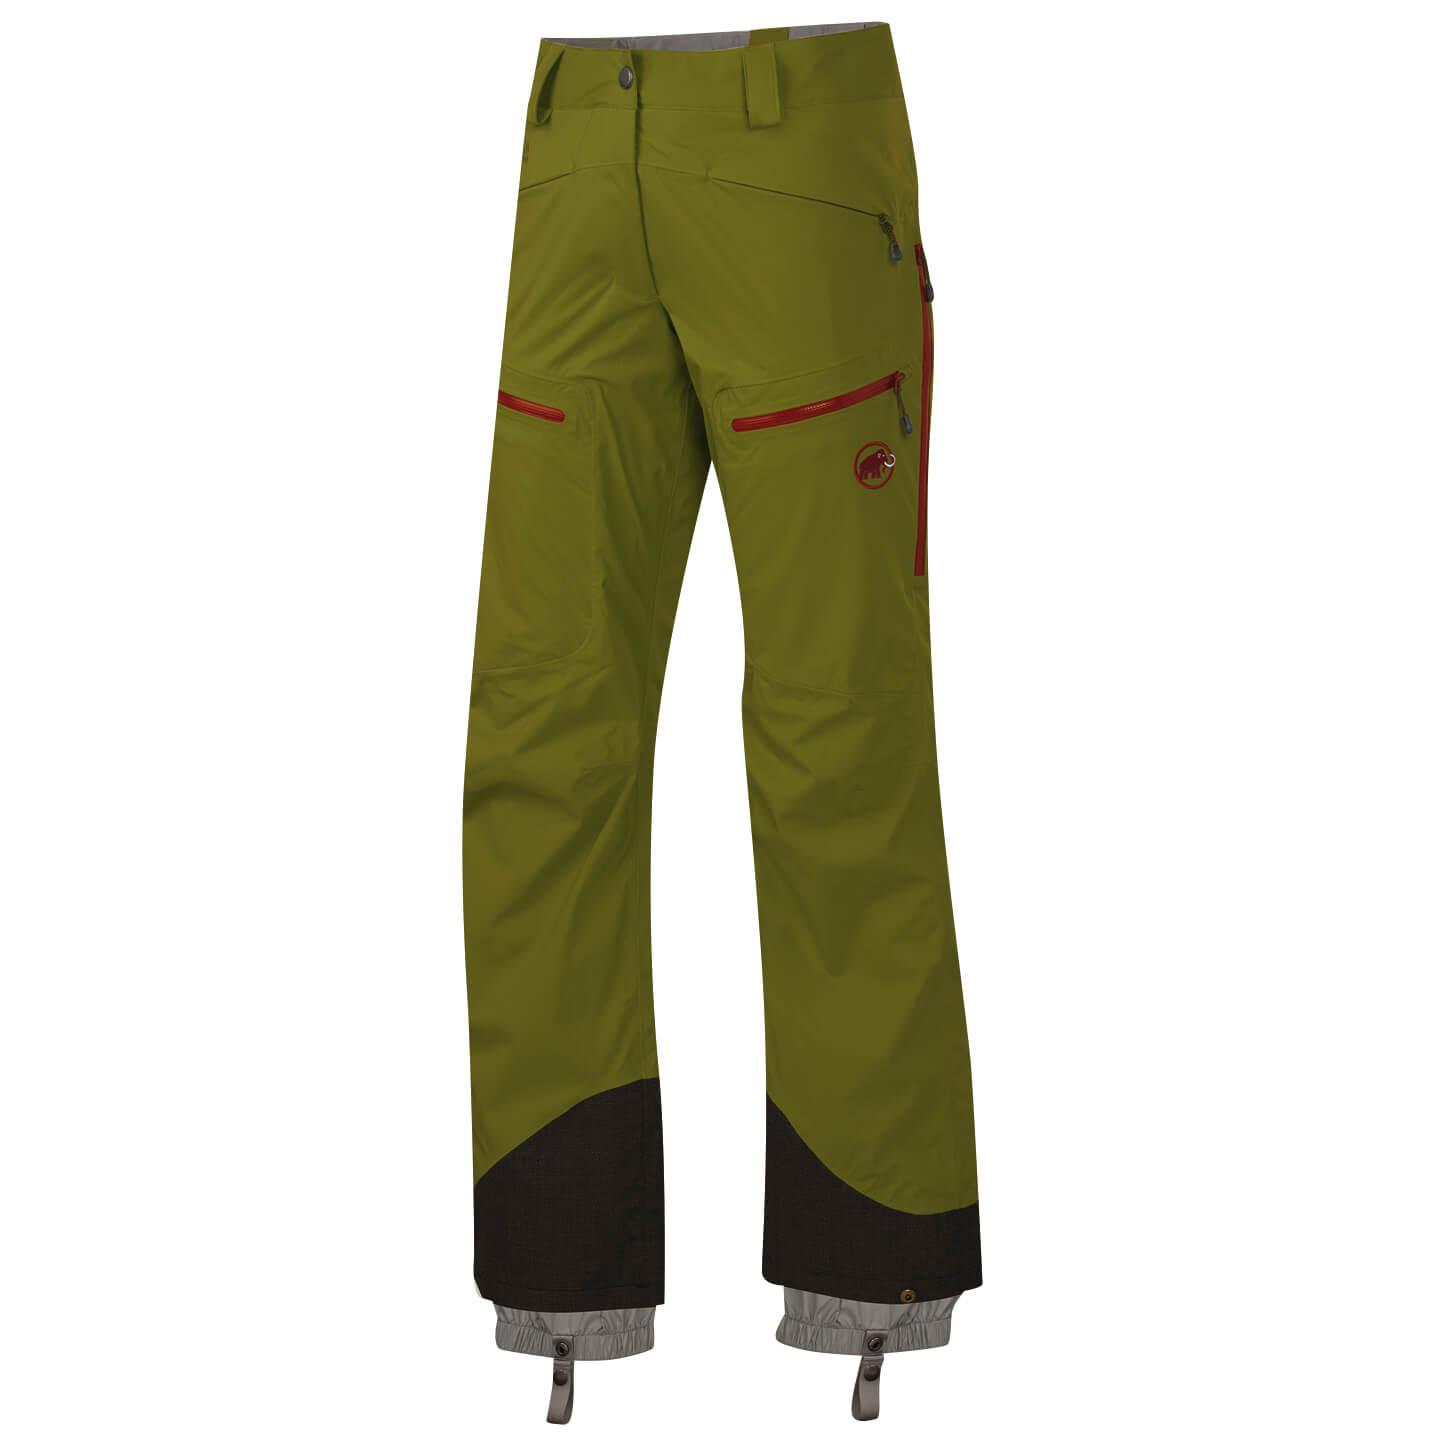 Wonderful Clothing For Women Gt Outdoor Pants Gtpants Pants Mammut Eismeer Light